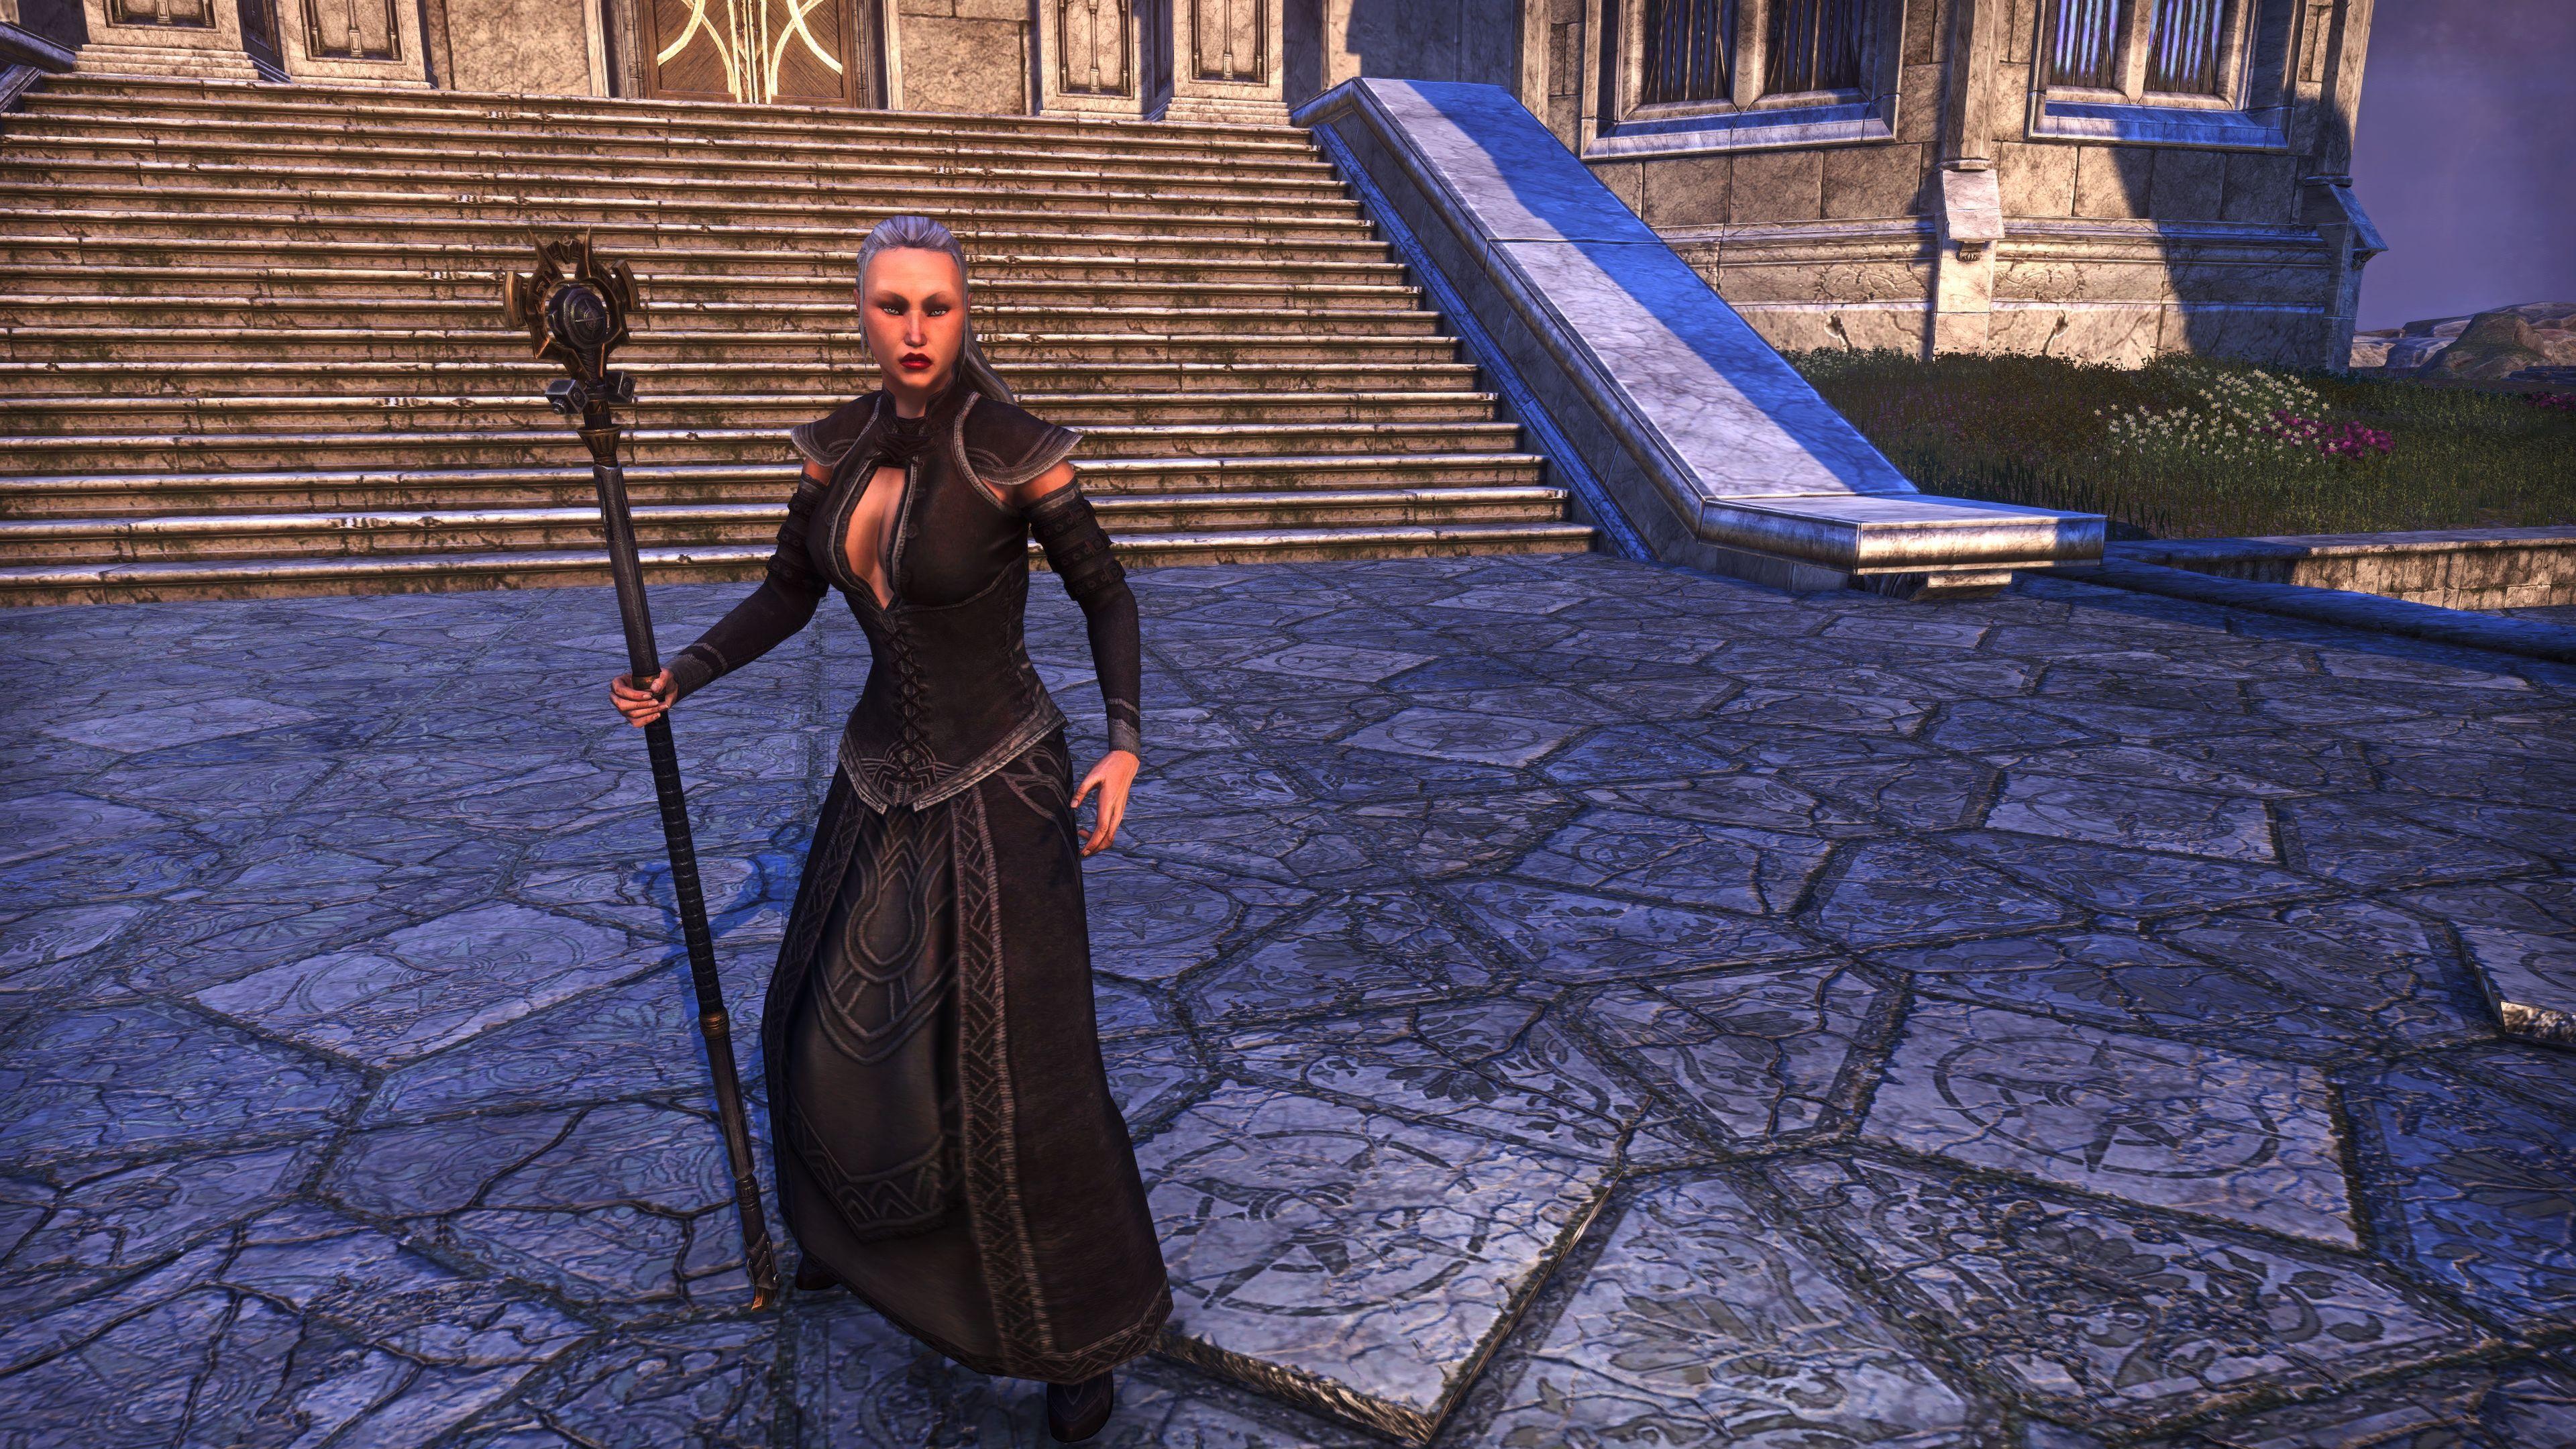 Dwarven Remnant Staff (Weapon Styles > Staff), Psijic Vault Crate, The Elder Scrolls Online